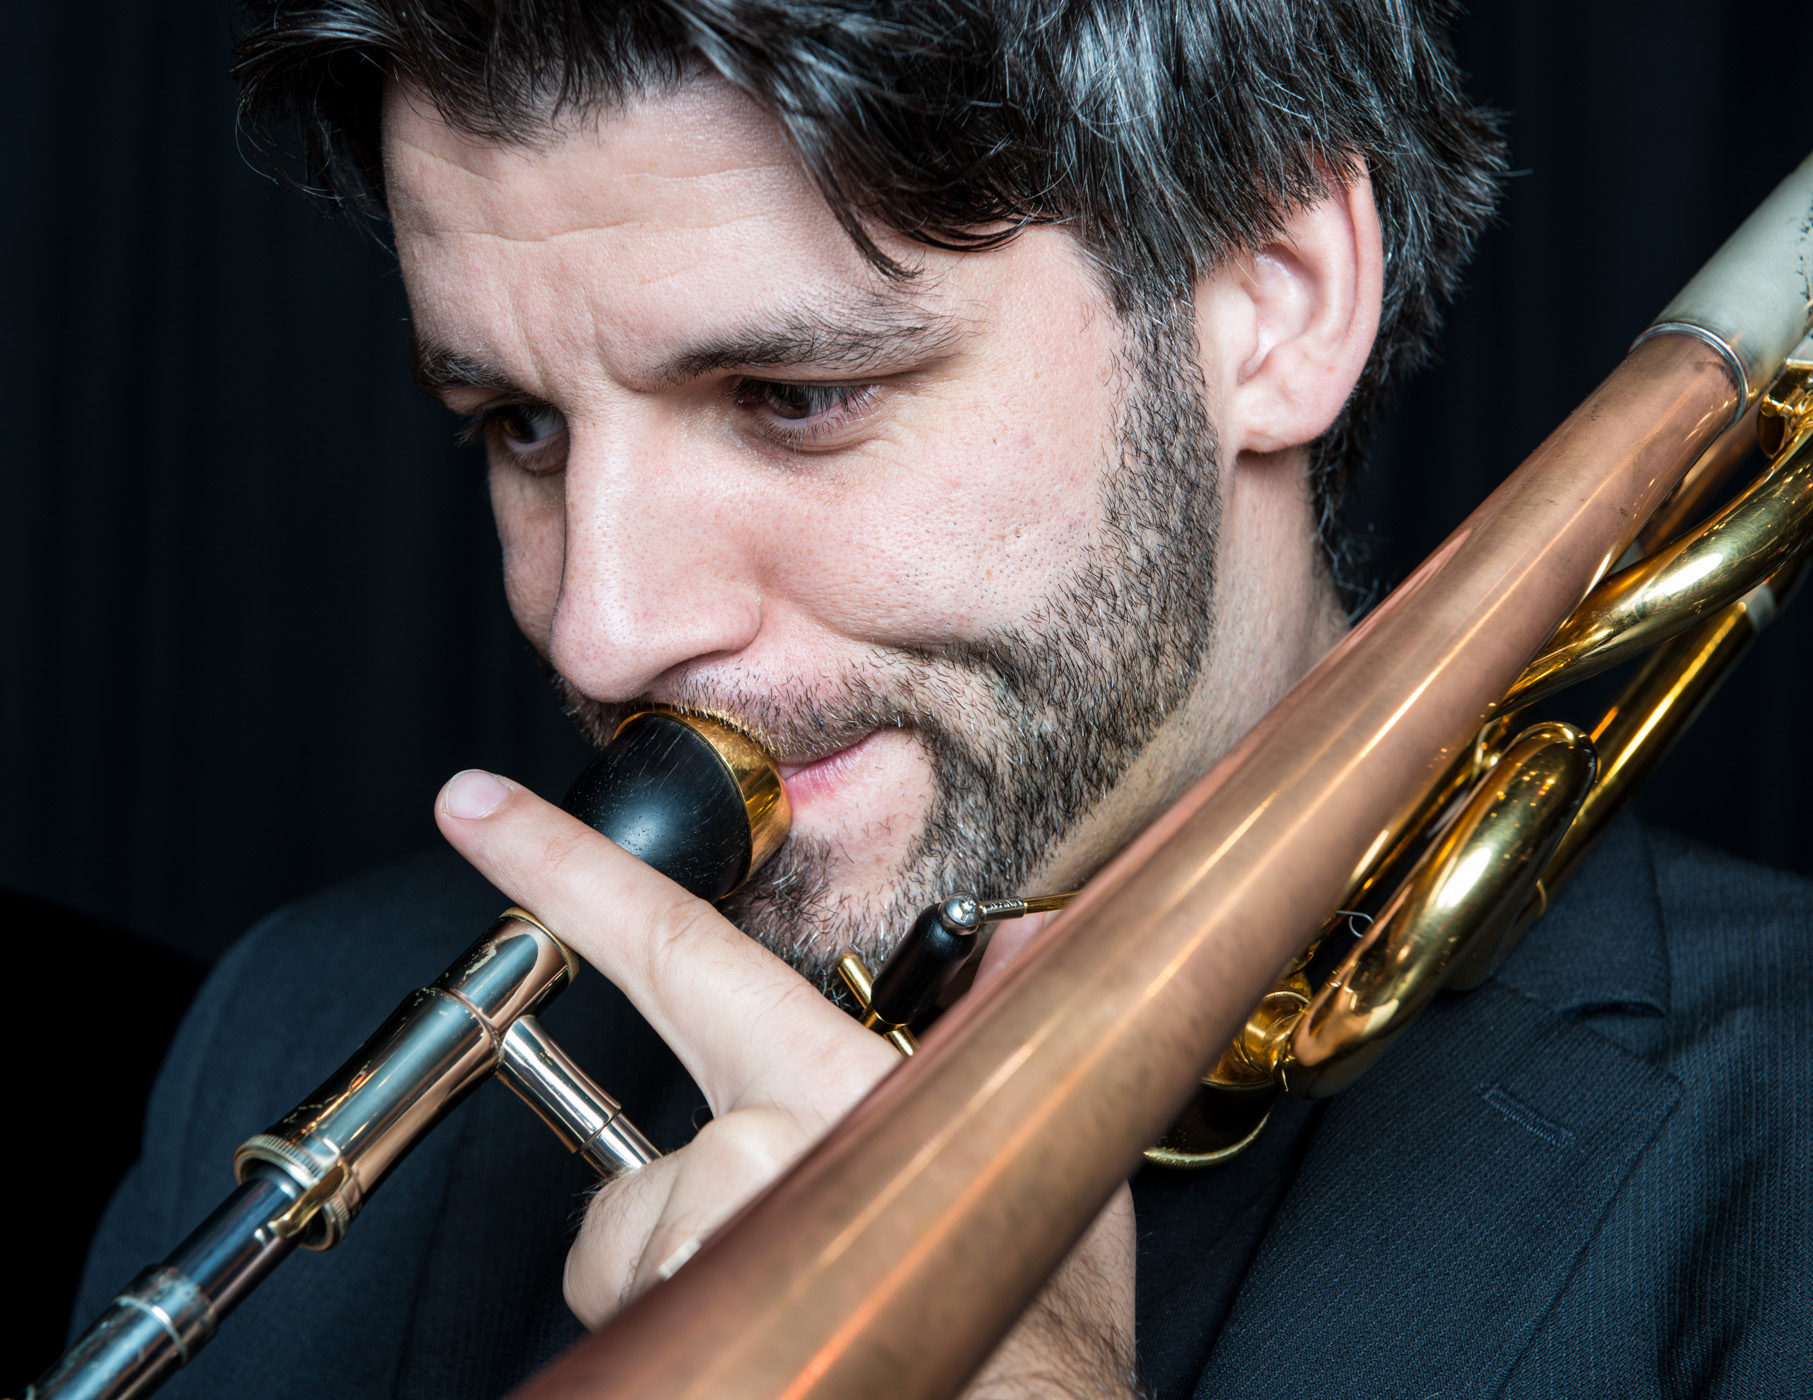 Zoltan Kiss And The World Of The Trombone Kissbone